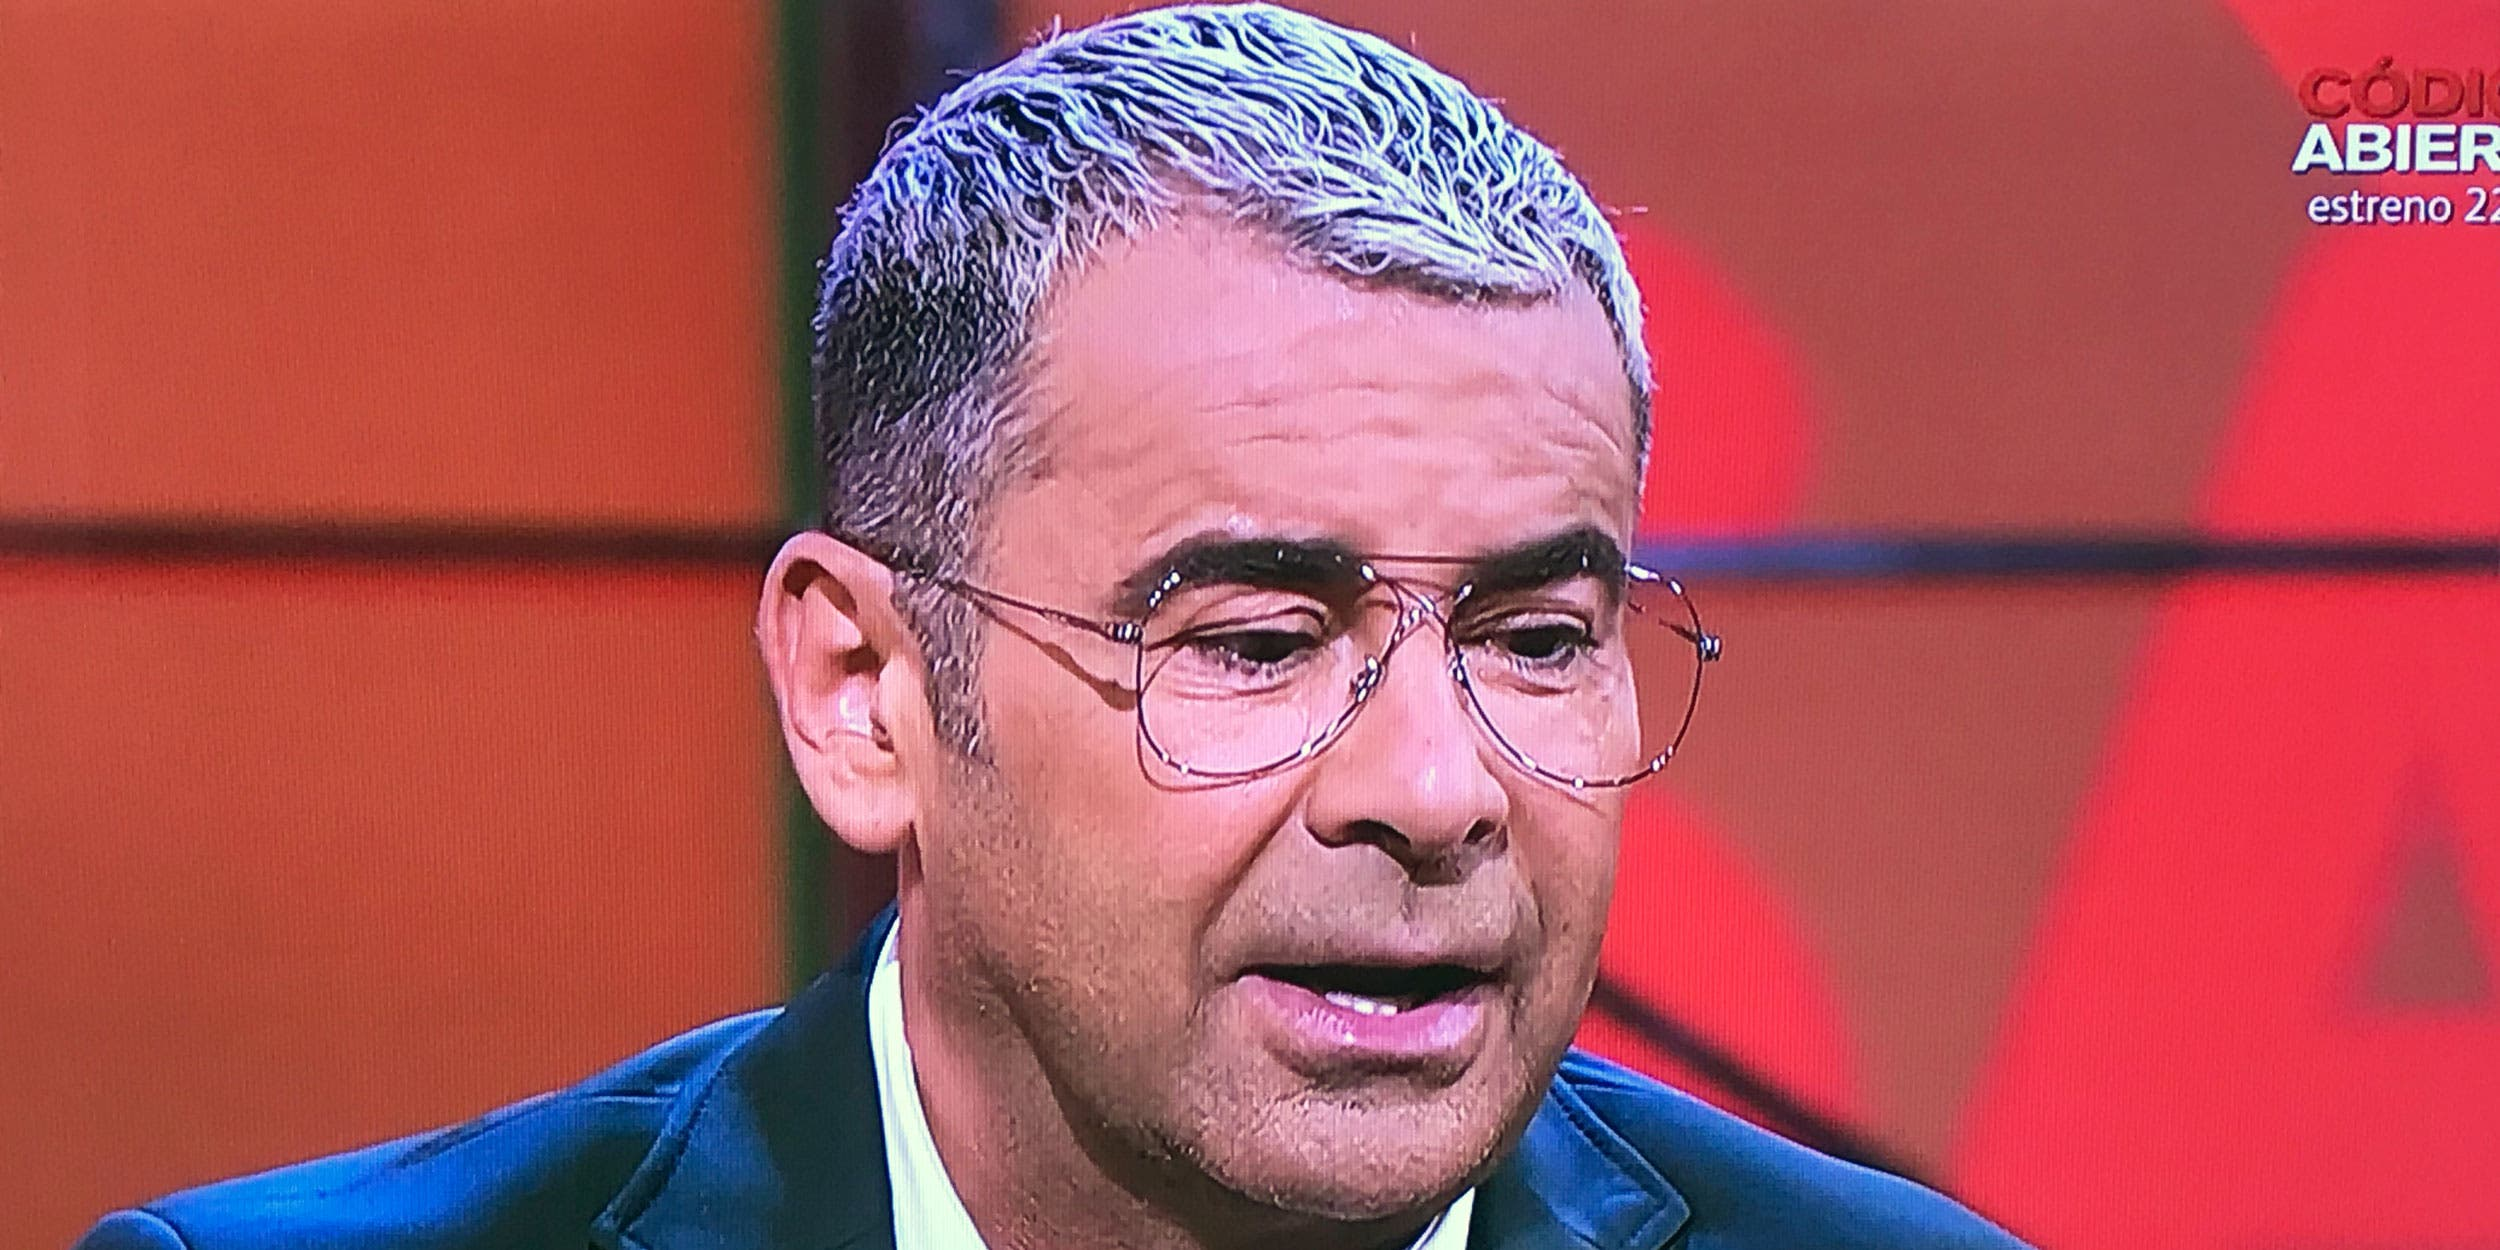 Jorge Javier Vázquez 'envía' a Chelo Gª Cortés a 'Viva la vida' si no está a gusto en 'Sálvame'